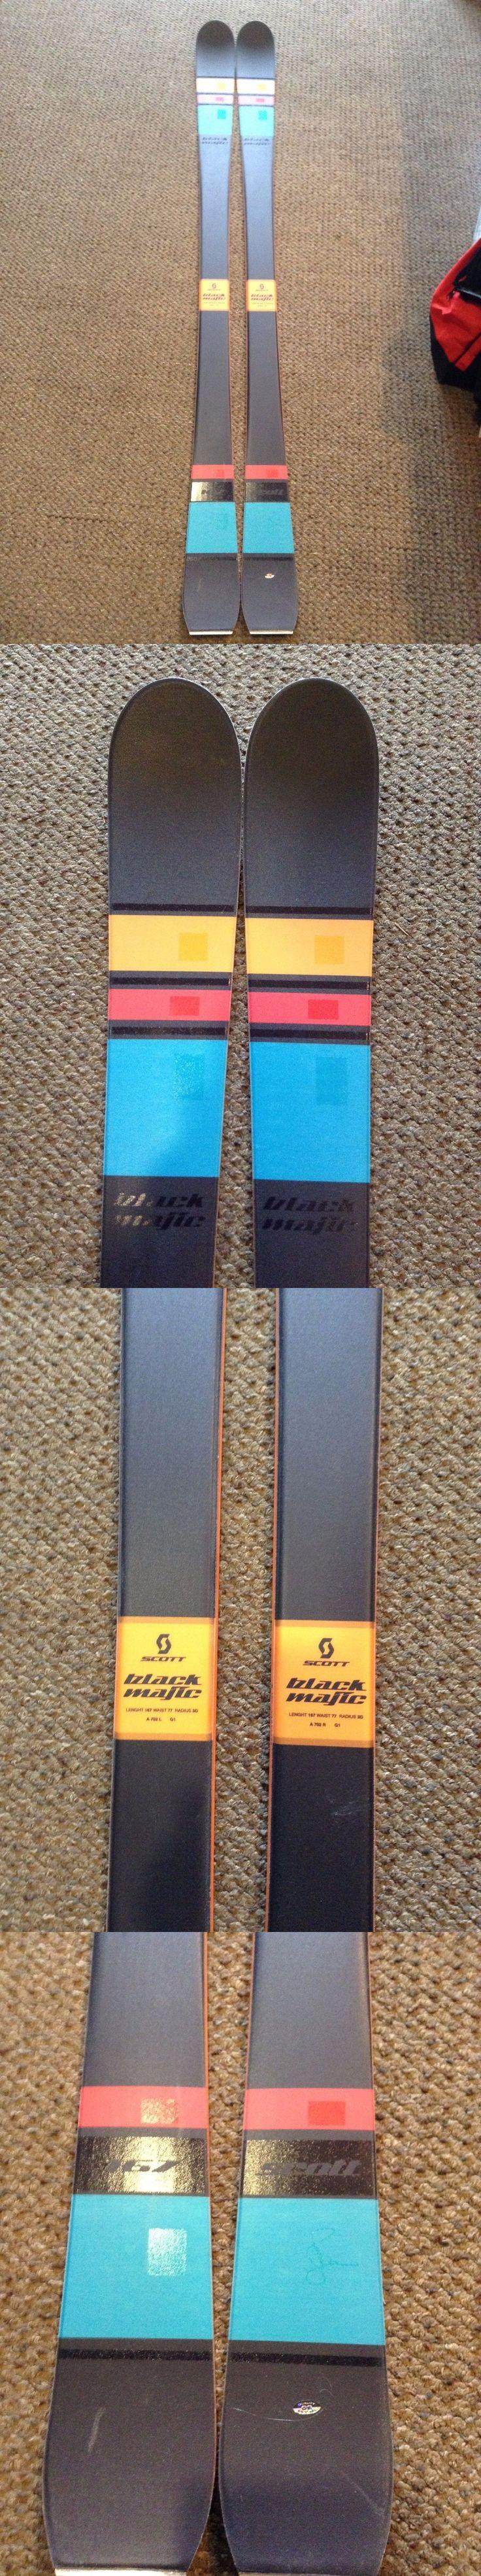 Skis 42814: 2015 Scott Black Majic Mens Skis 167Cm **New Old Stock** -> BUY IT NOW ONLY: $250 on eBay!